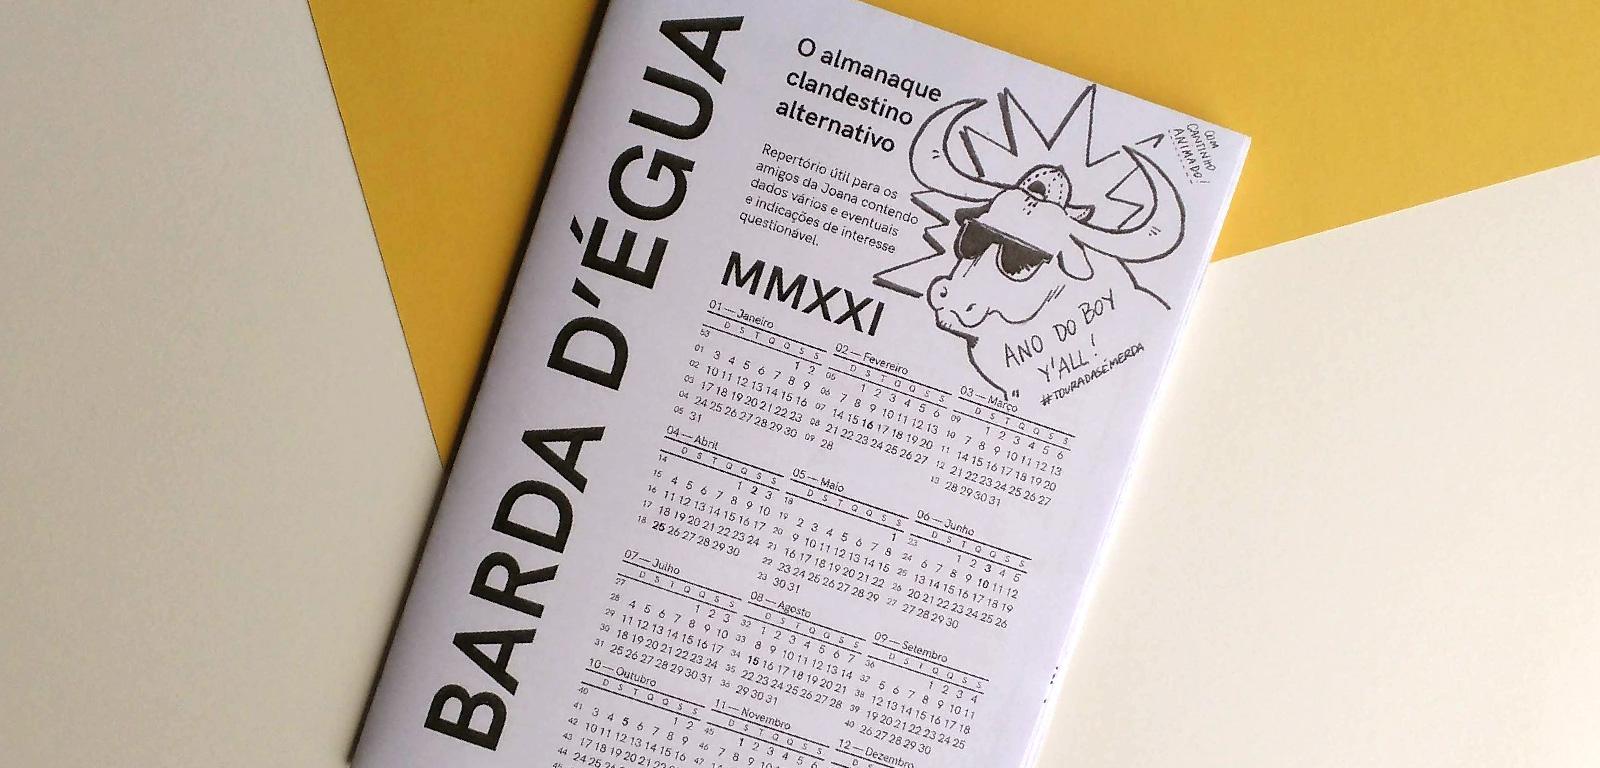 Barda d'Égua MMXXI - alternative clandestine almanac